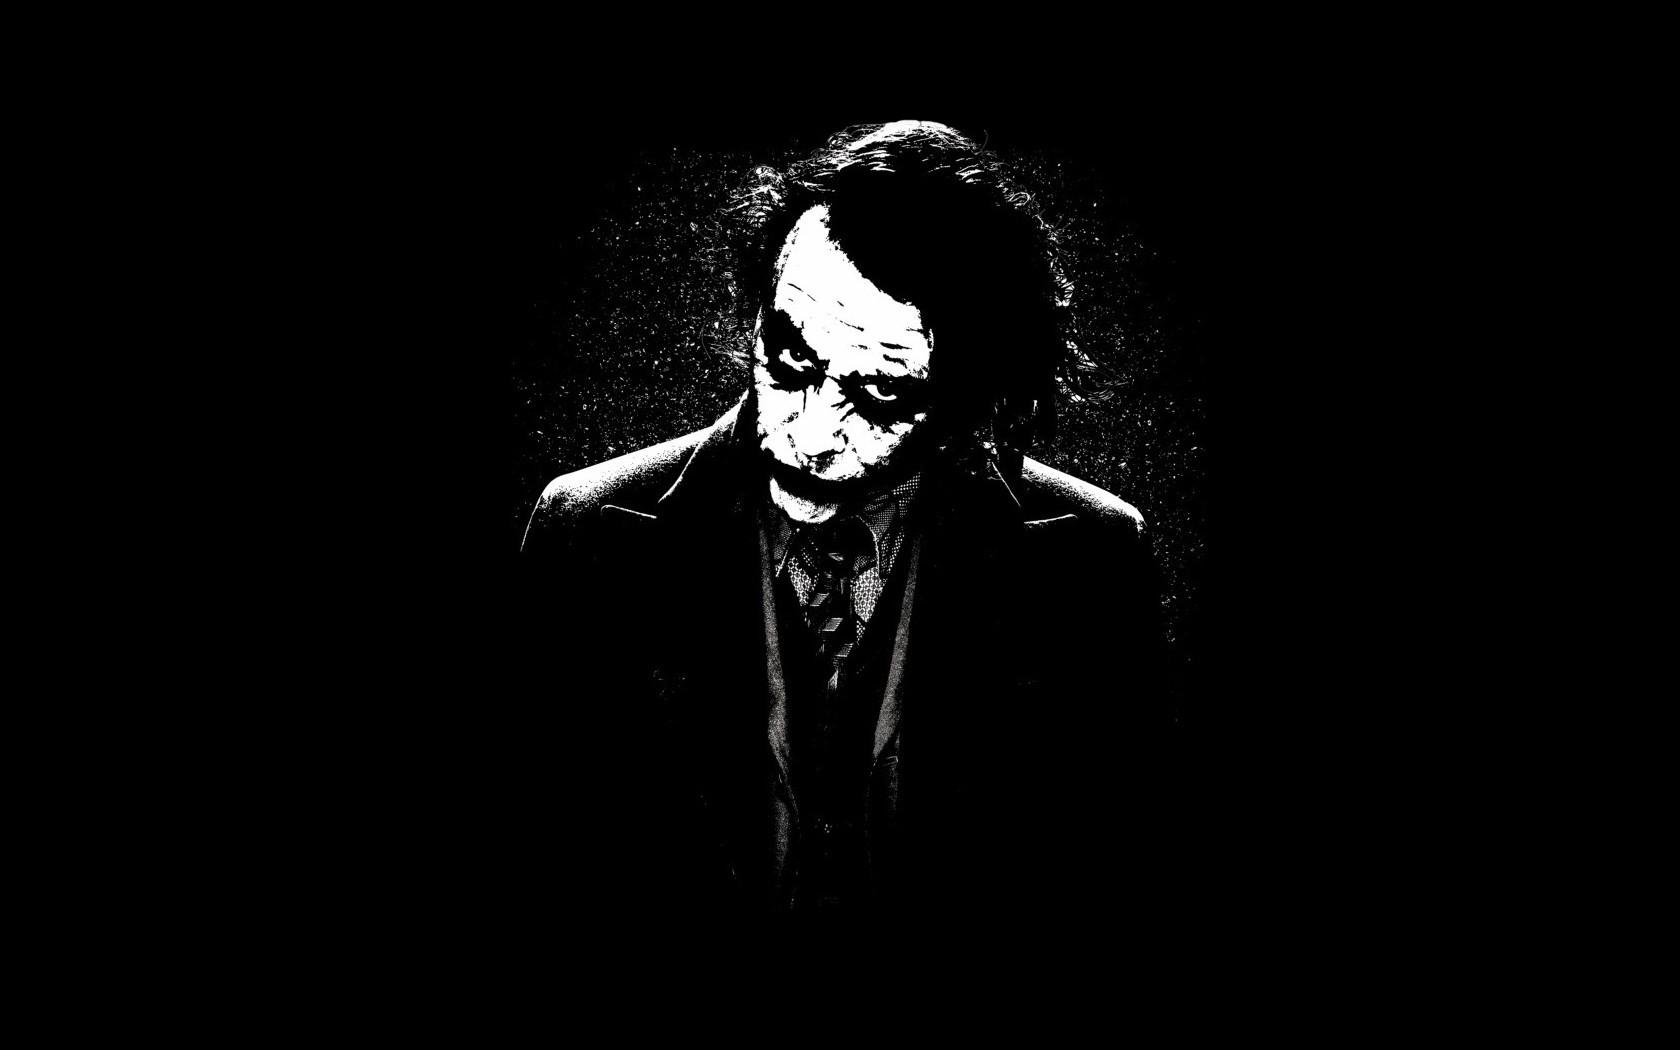 Wallpaper : The Dark Knight, Batman, Joker, movies, Heath ...